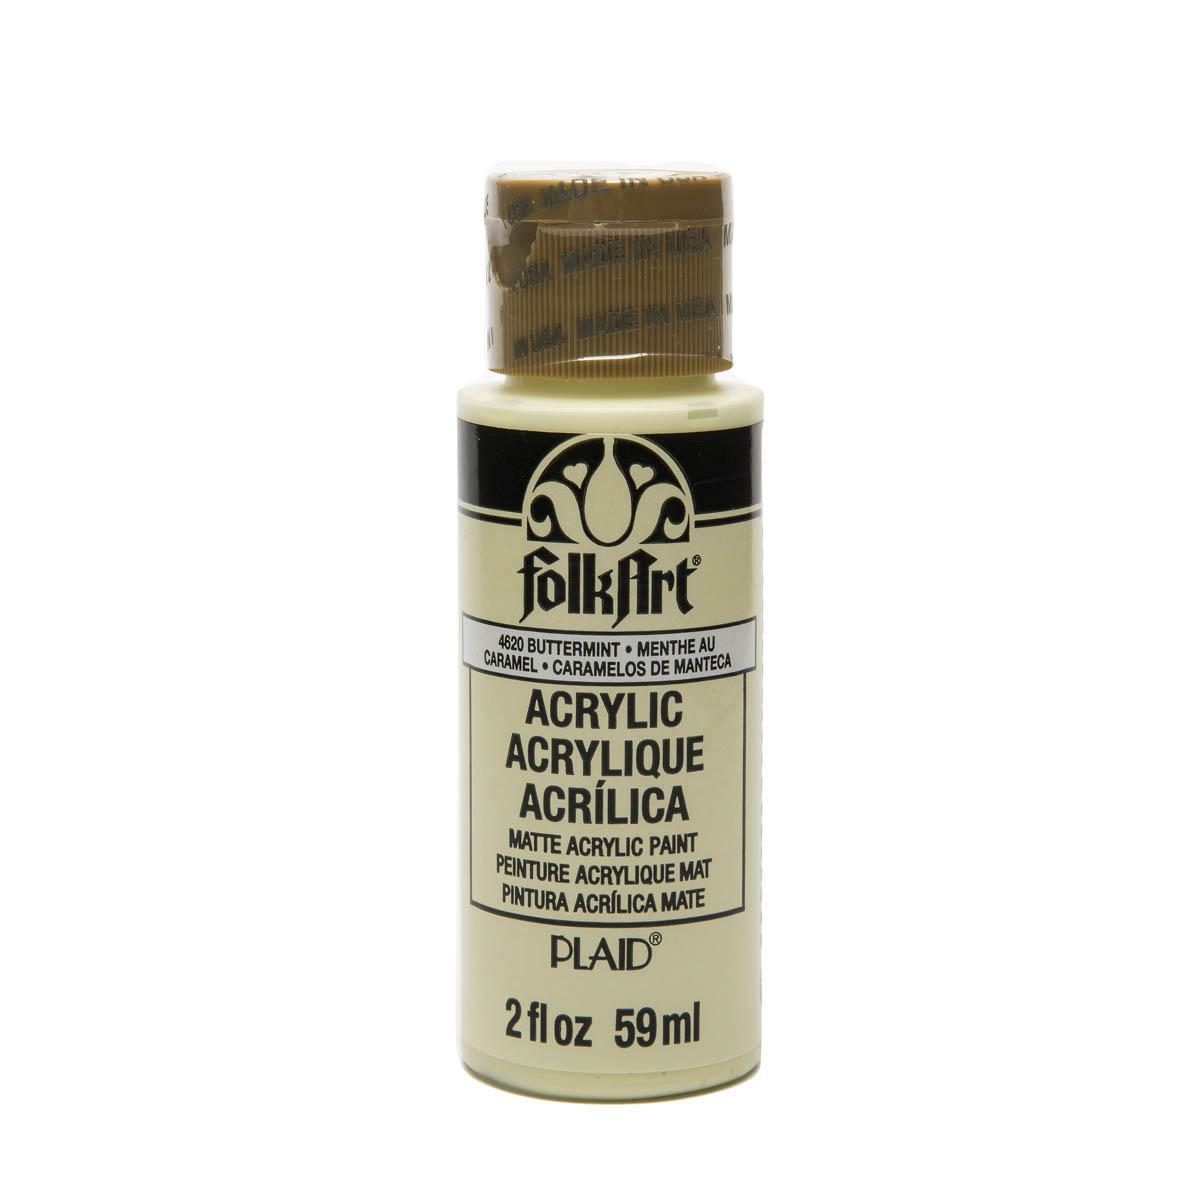 FolkArt ® Acrylic Colors - Buttermint, 2 oz. - 4620